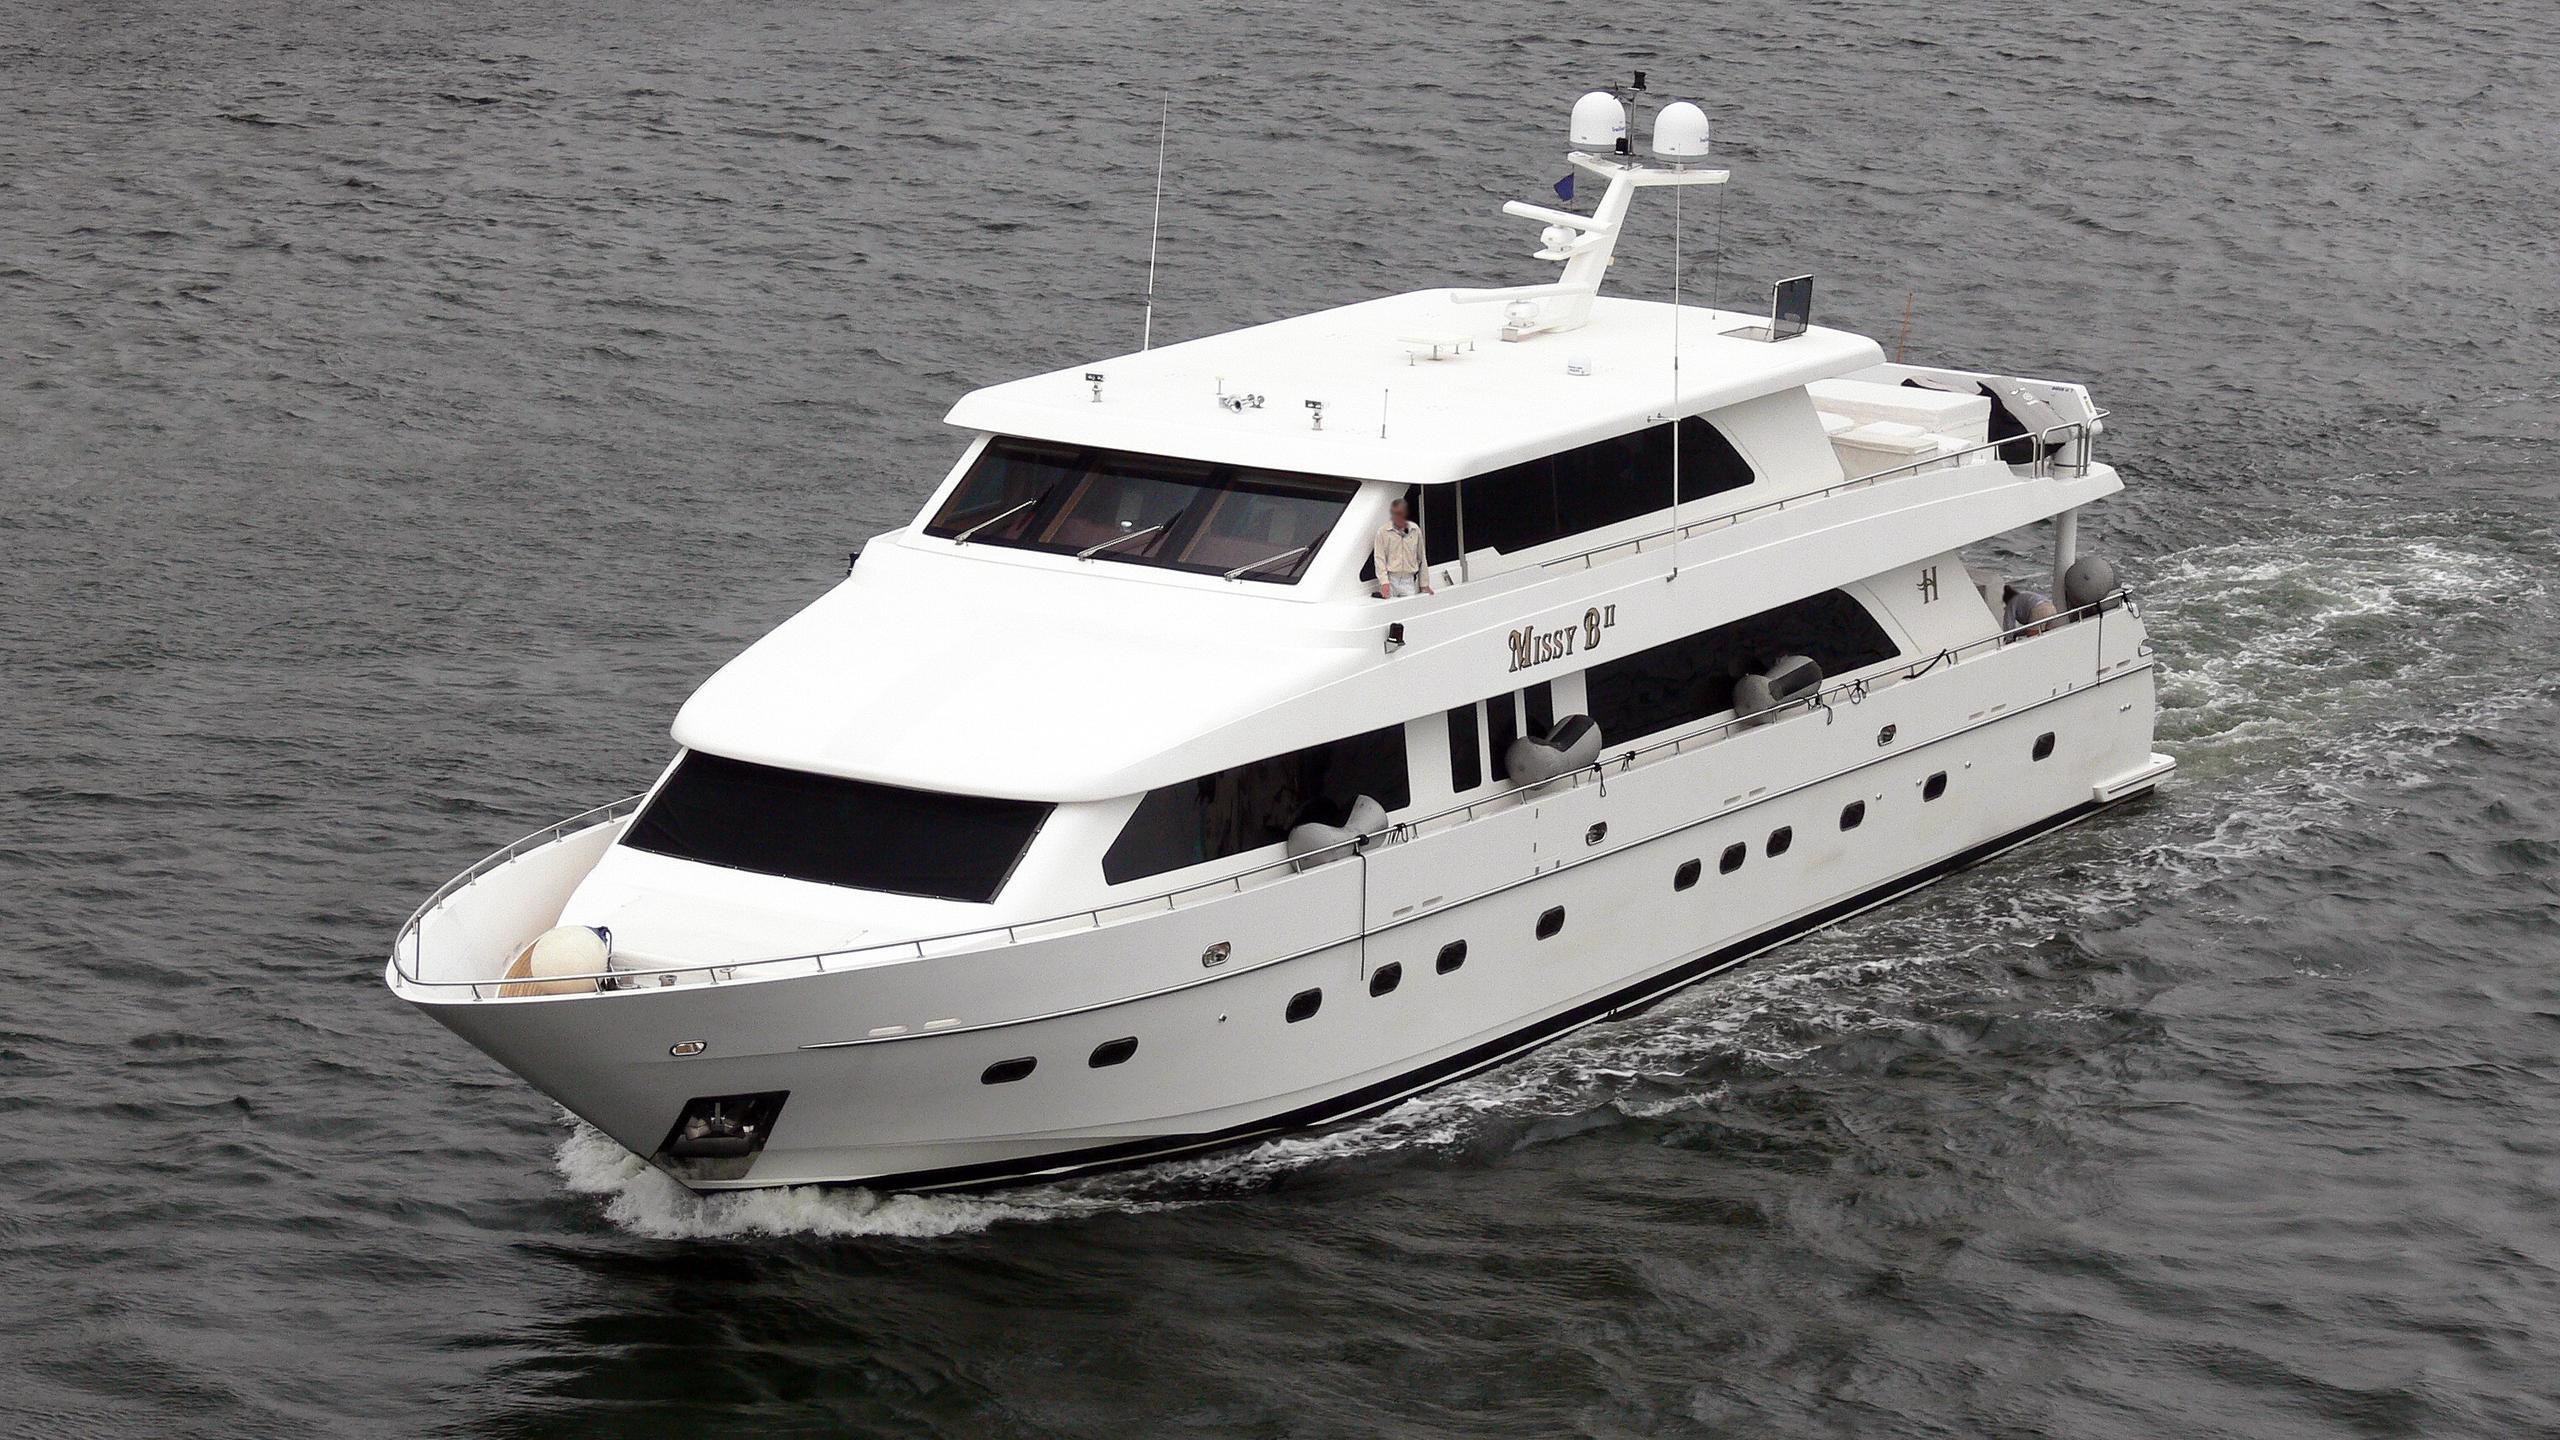 missy-b-ii-motor-yacht-hargrave-115-2004-35m-before-refit